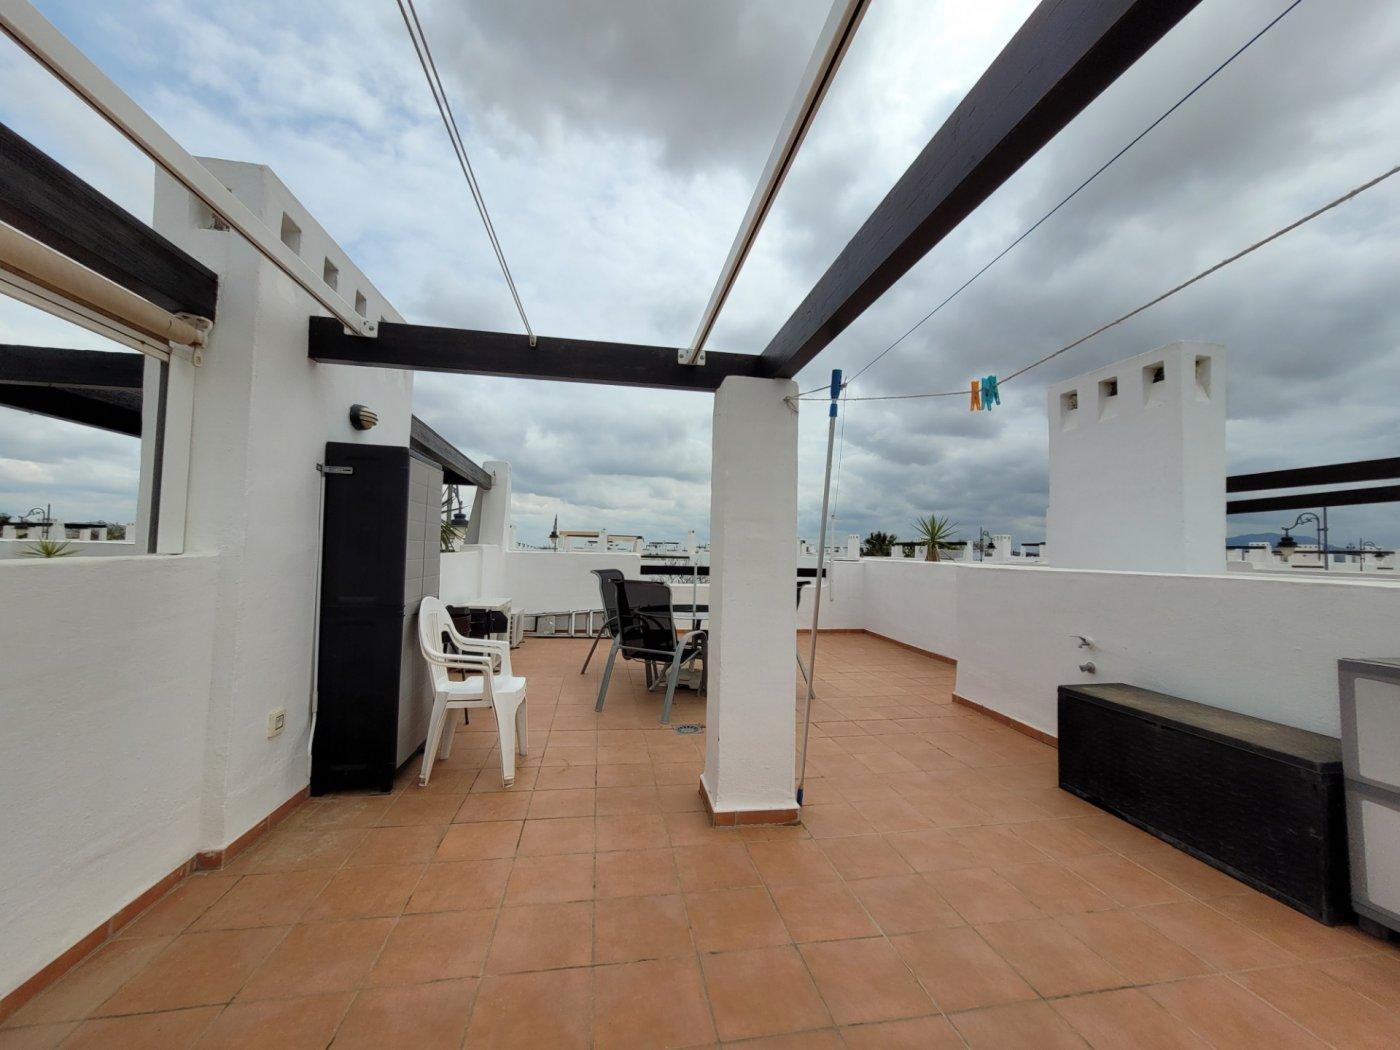 Gallery Image 12 of Apartment For rent in Condado De Alhama, Alhama De Murcia With Pool